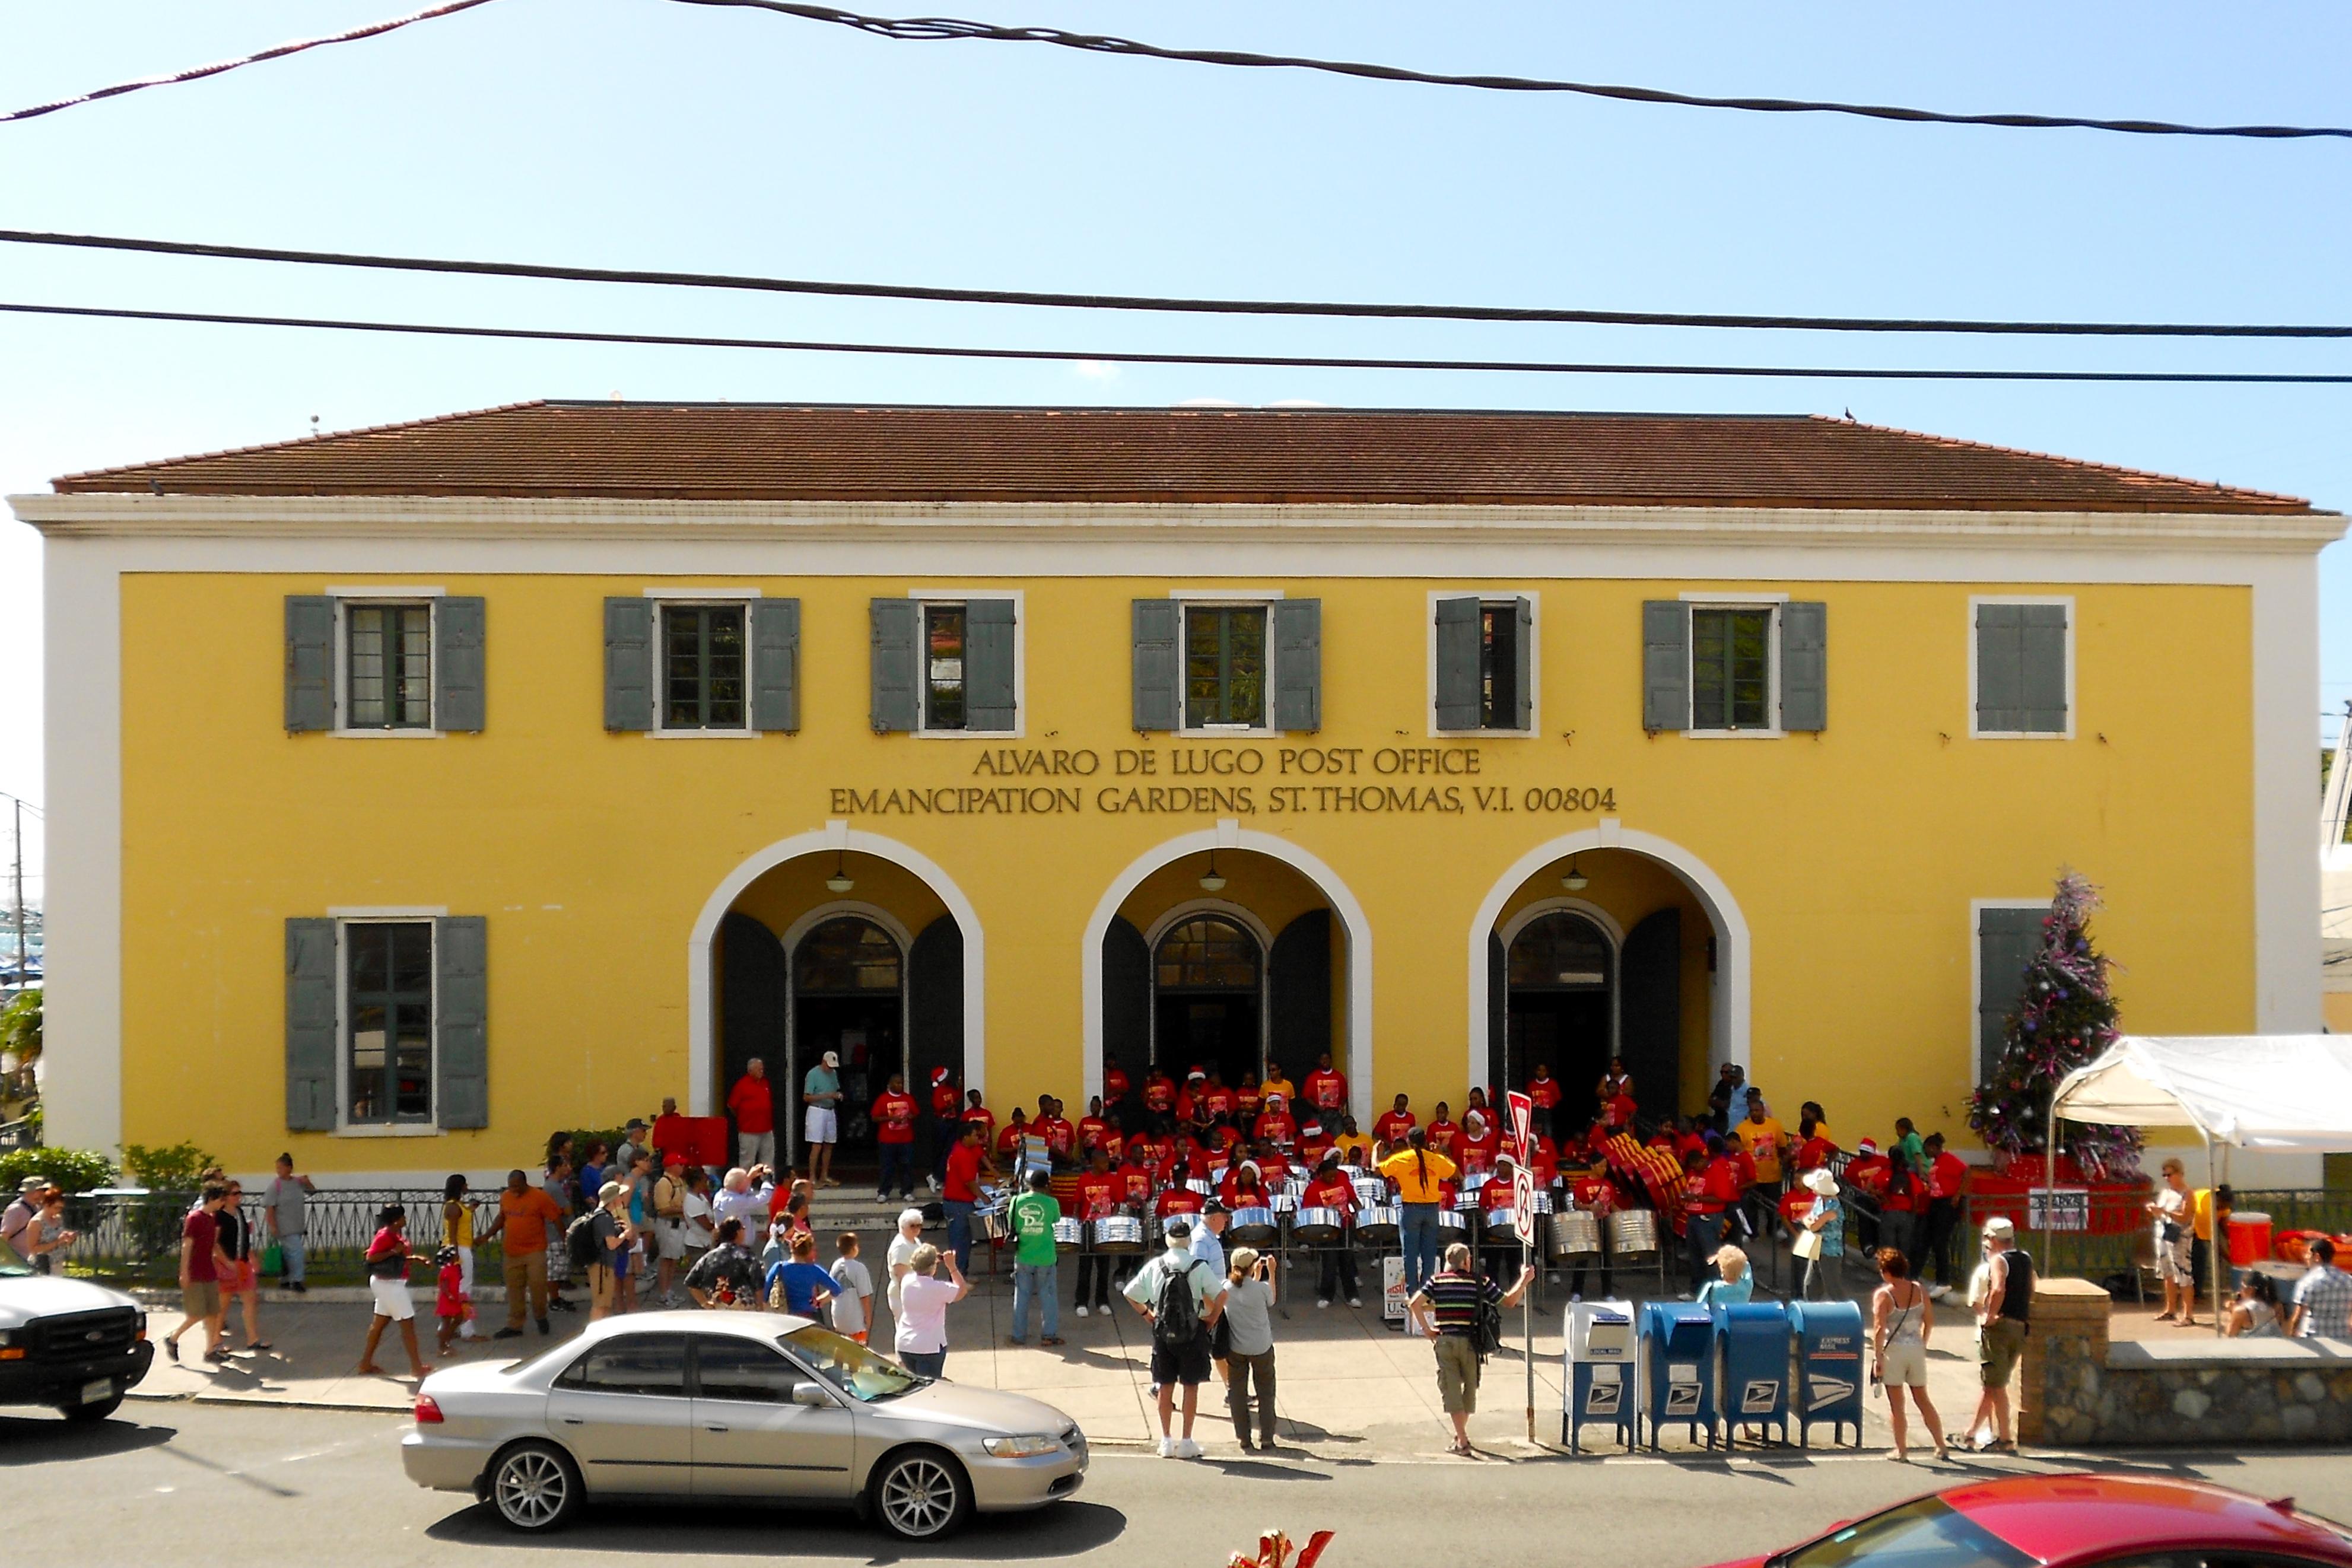 File:Charlotte Amalie Post Office.JPG - Wikimedia Commons